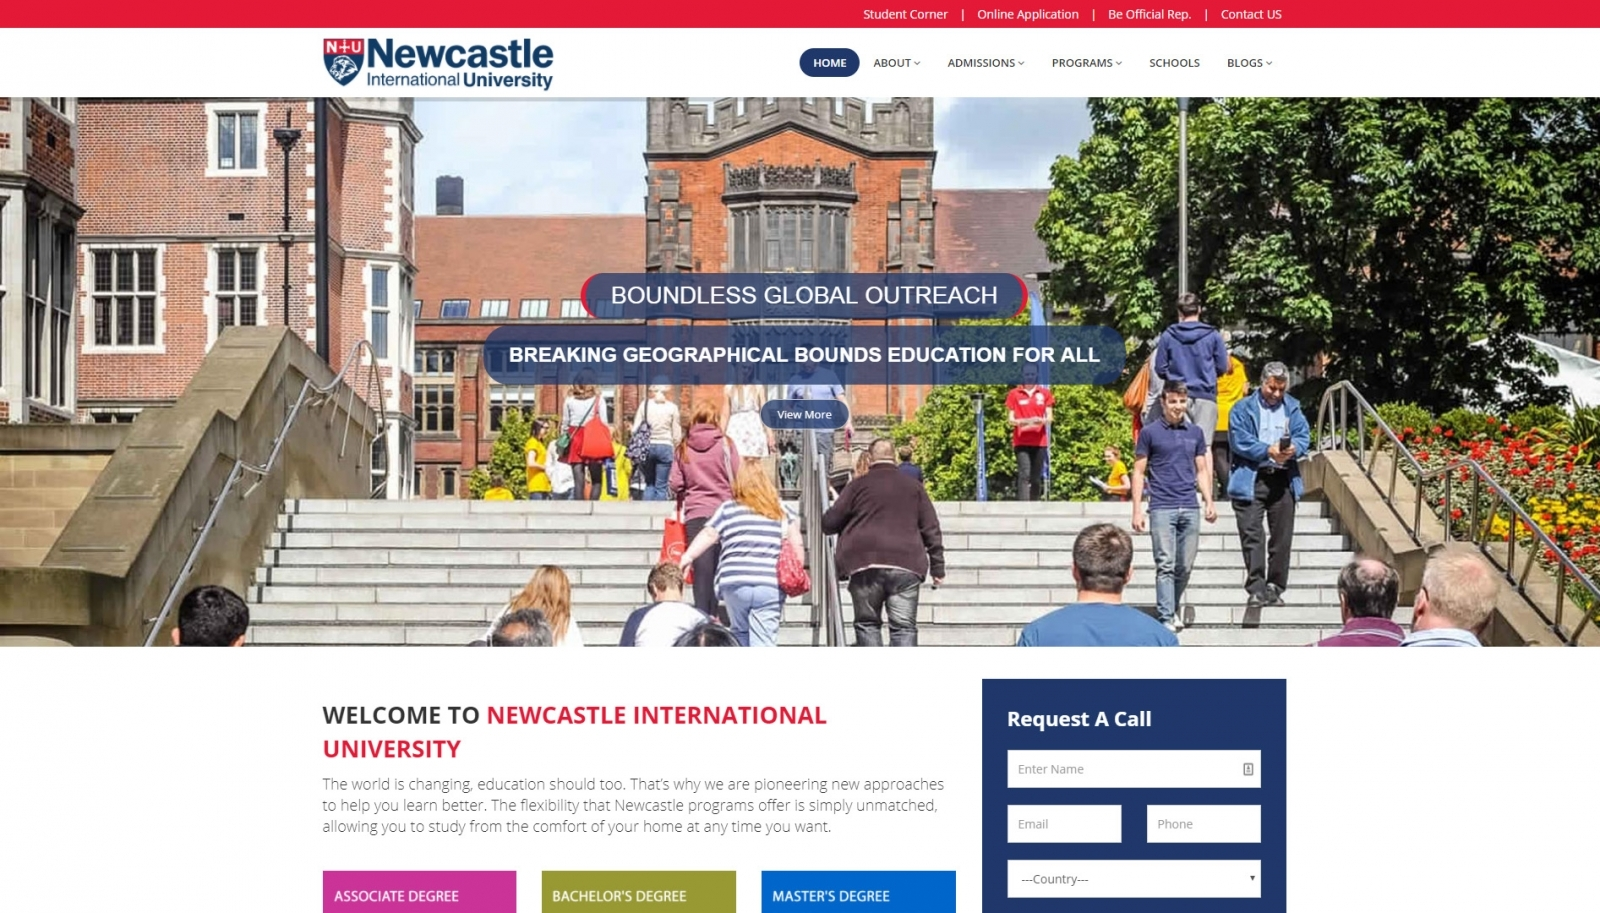 The fake Newcastle University website